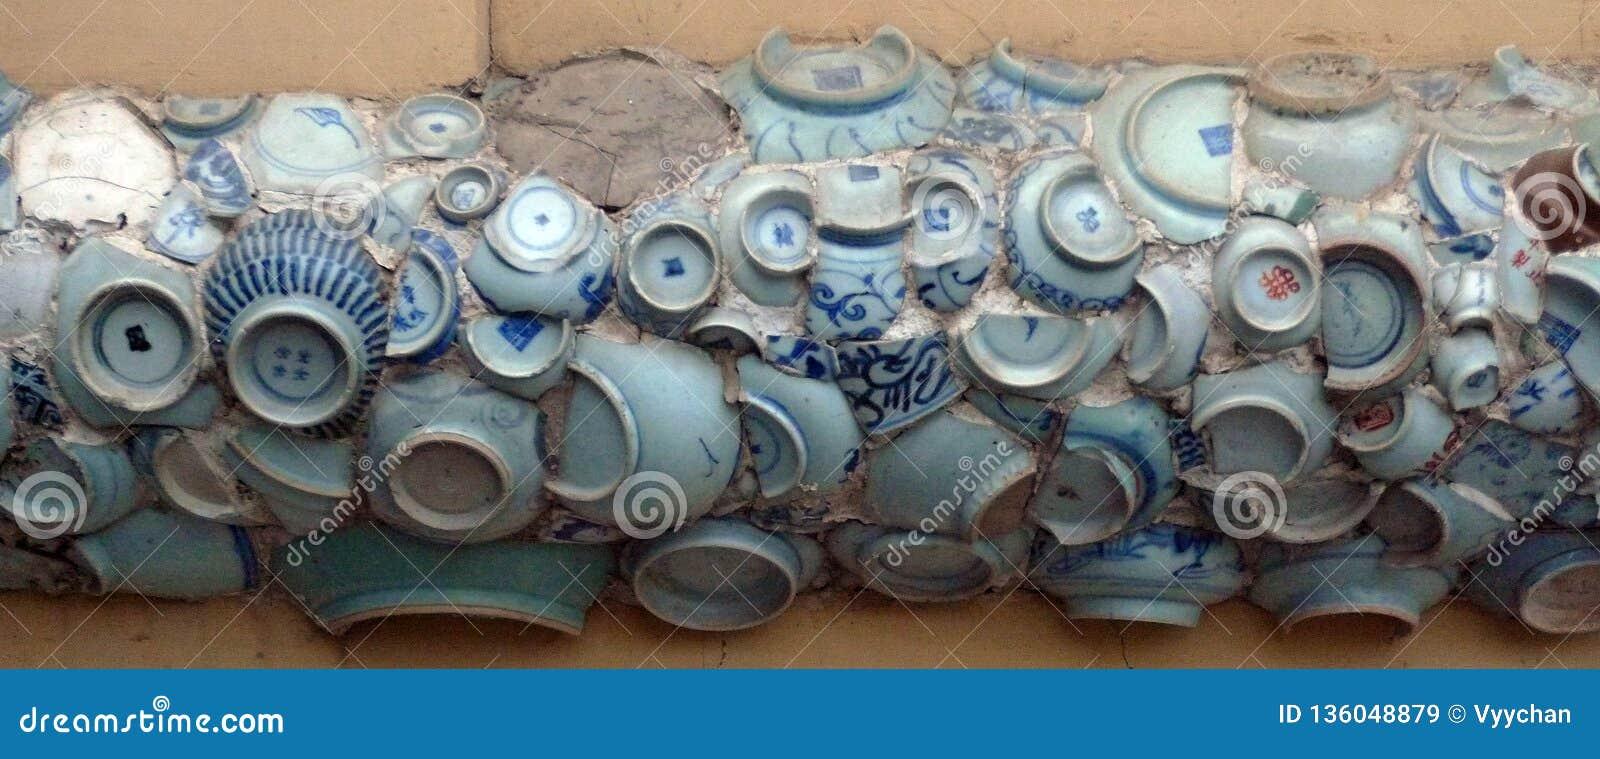 China Porcelain House Museum ChinaHouse Tianjin Ceramic tile Bowl Mosaic